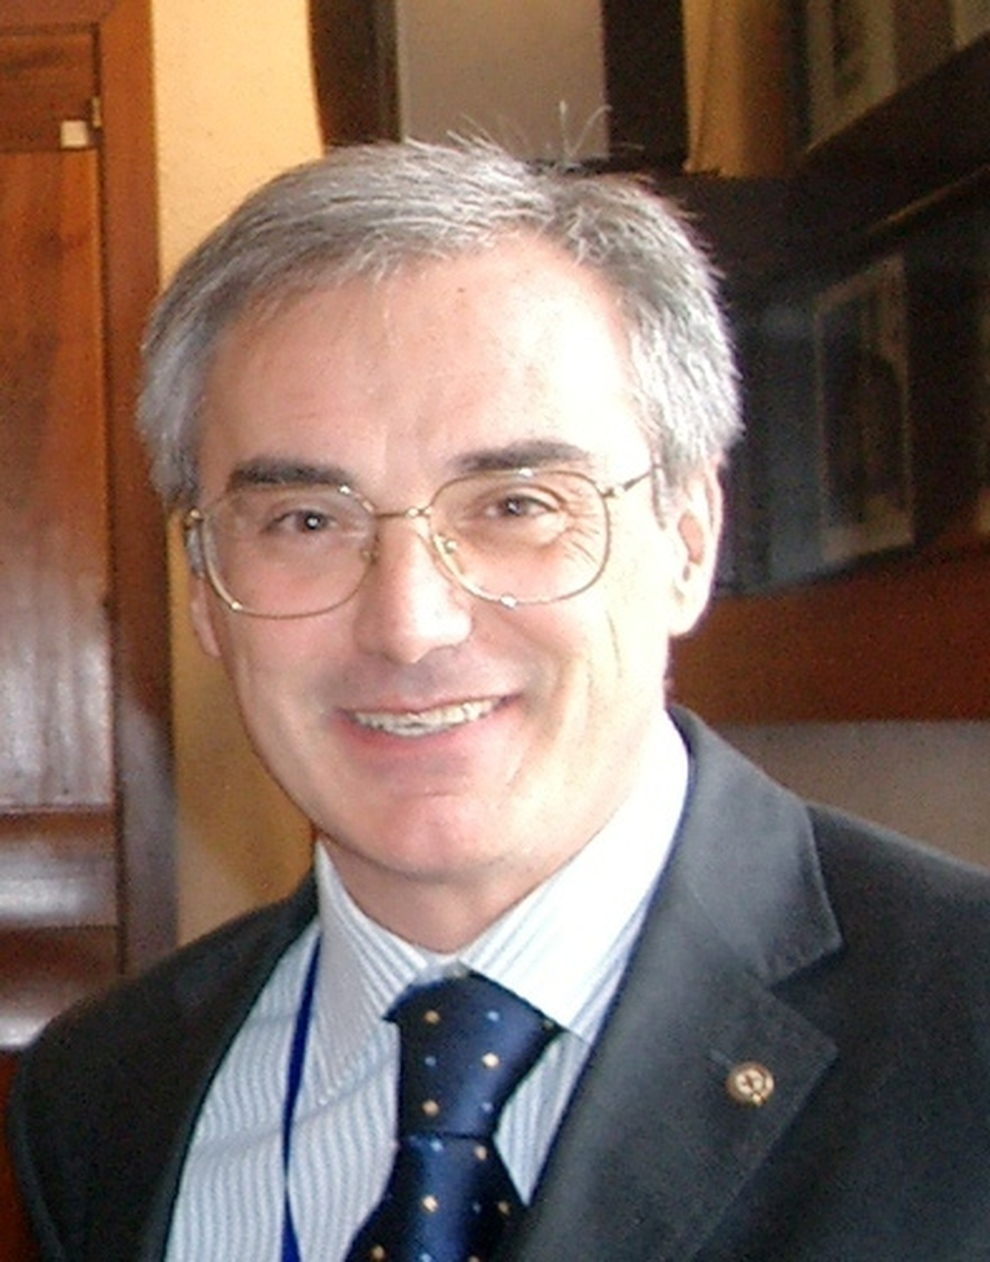 Giuseppe Battimelli